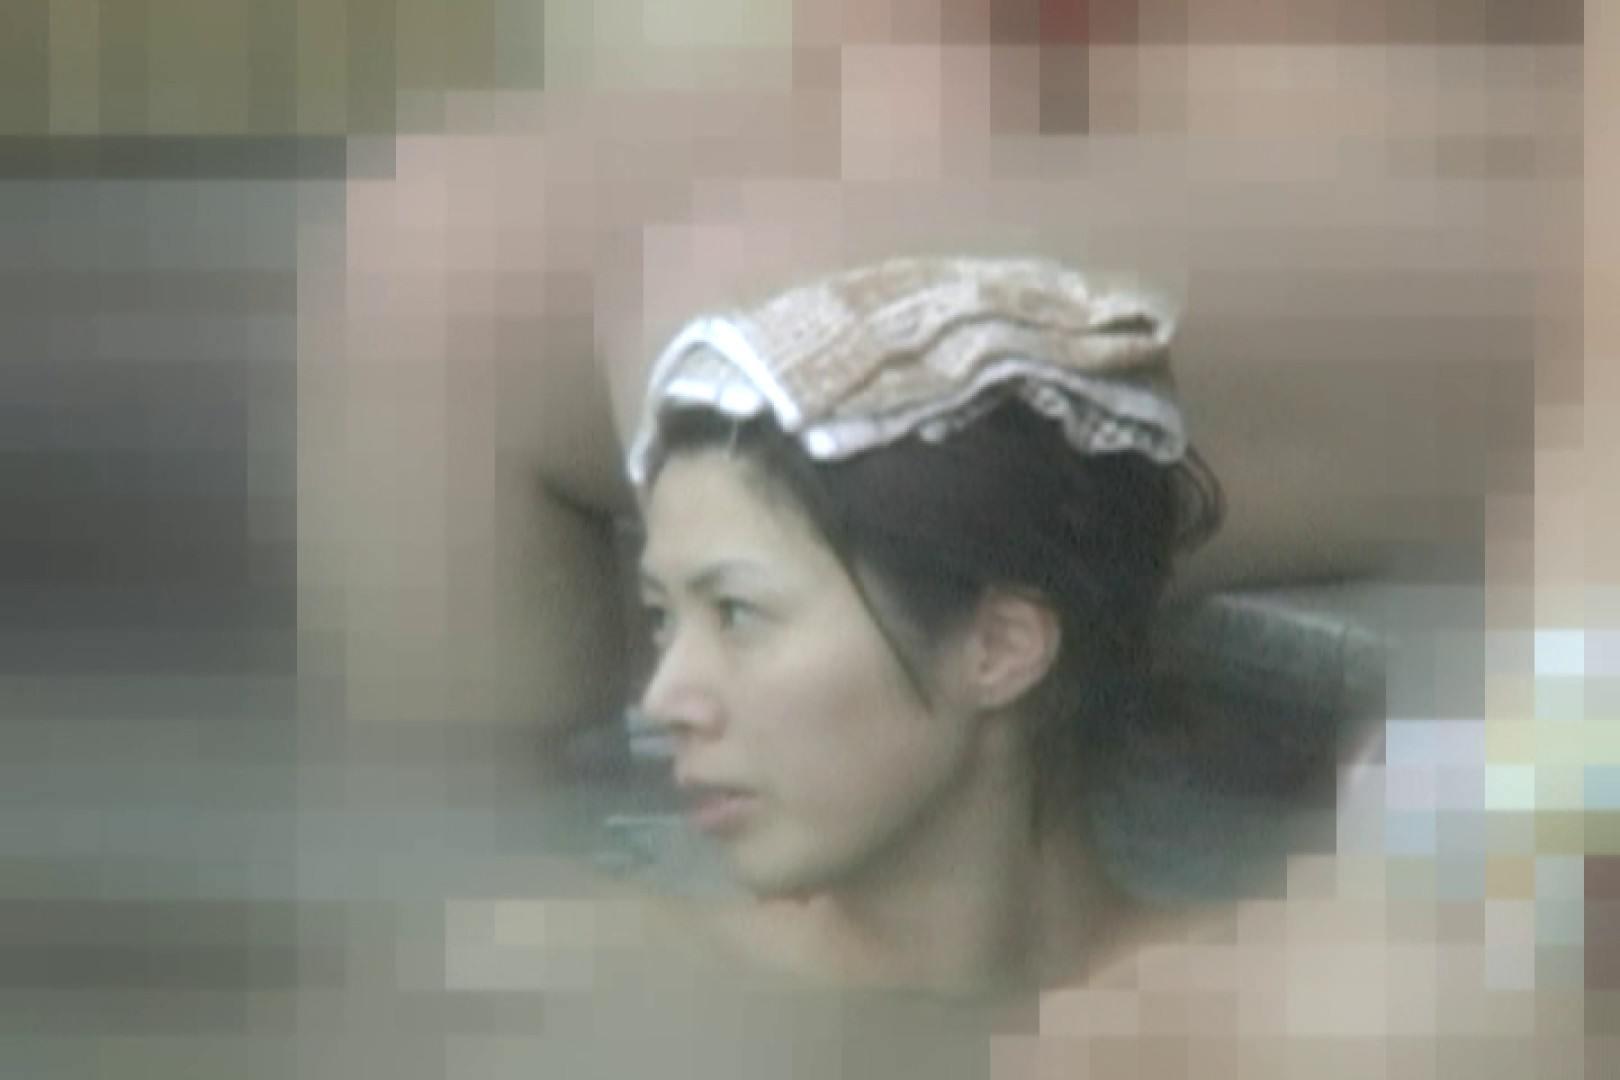 Aquaな露天風呂Vol.856 OLのエロ生活 SEX無修正画像 74連発 44